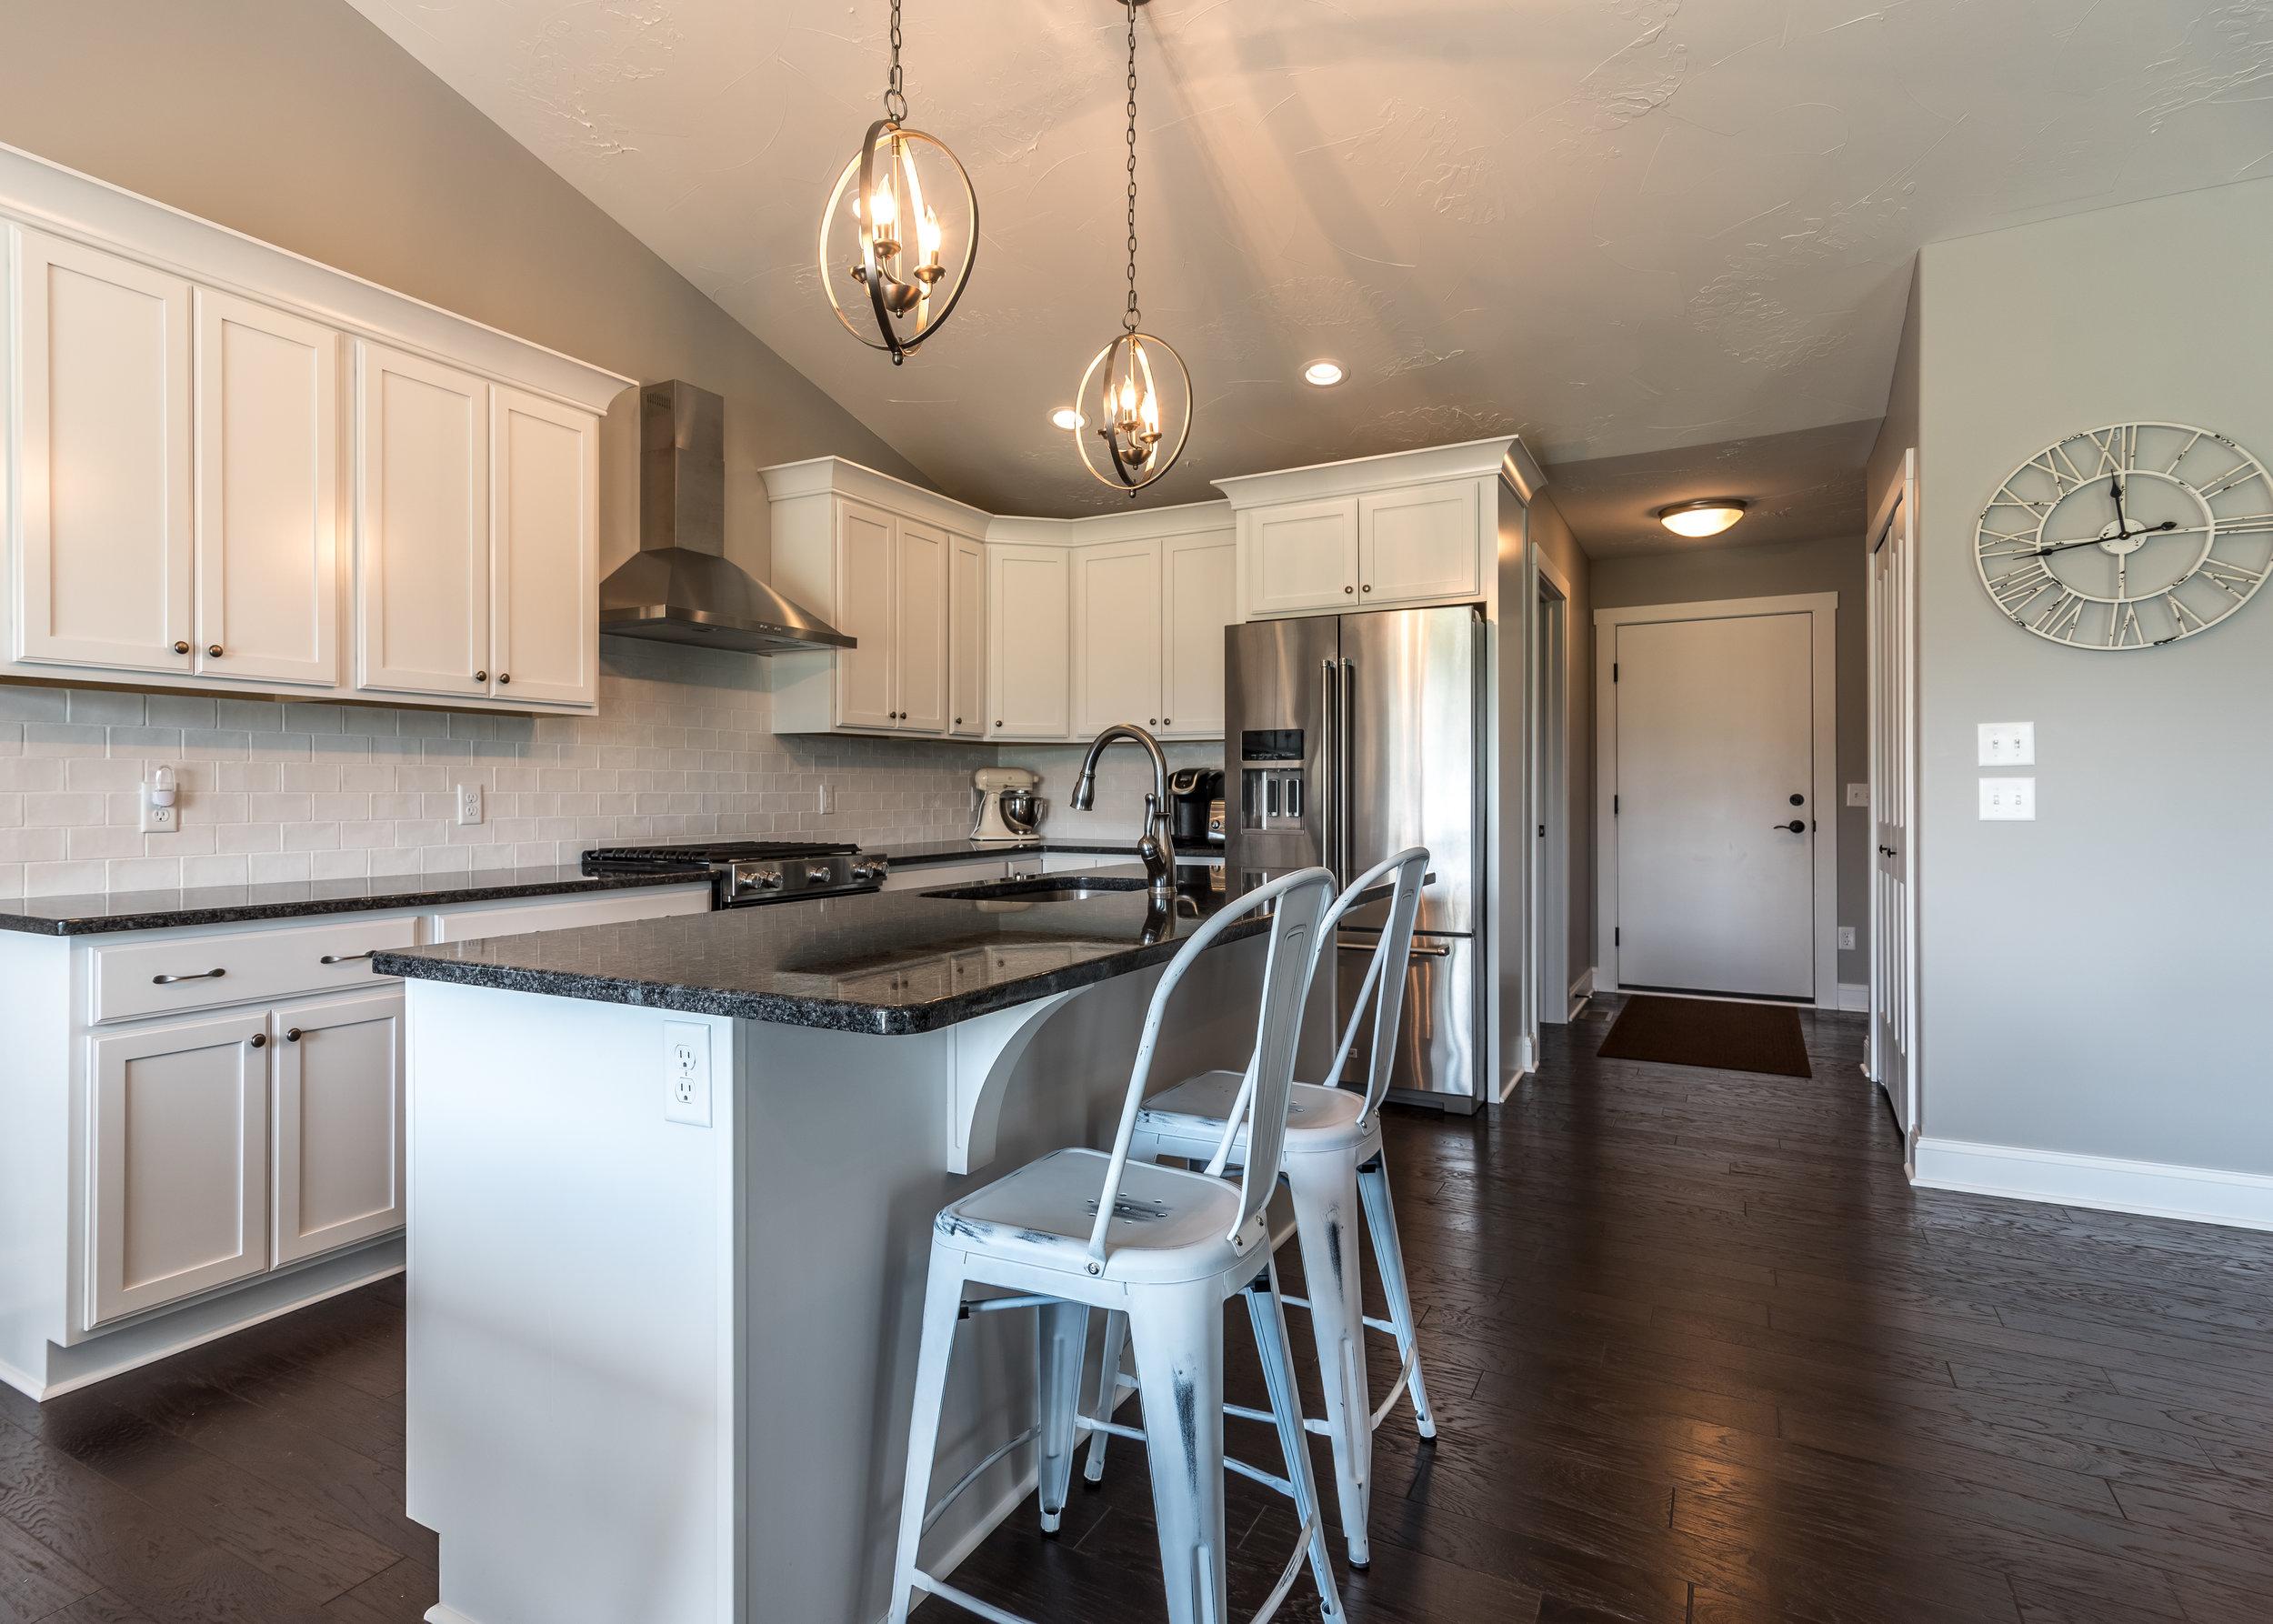 PH_Design_and_construction_skipper_kitchen_island